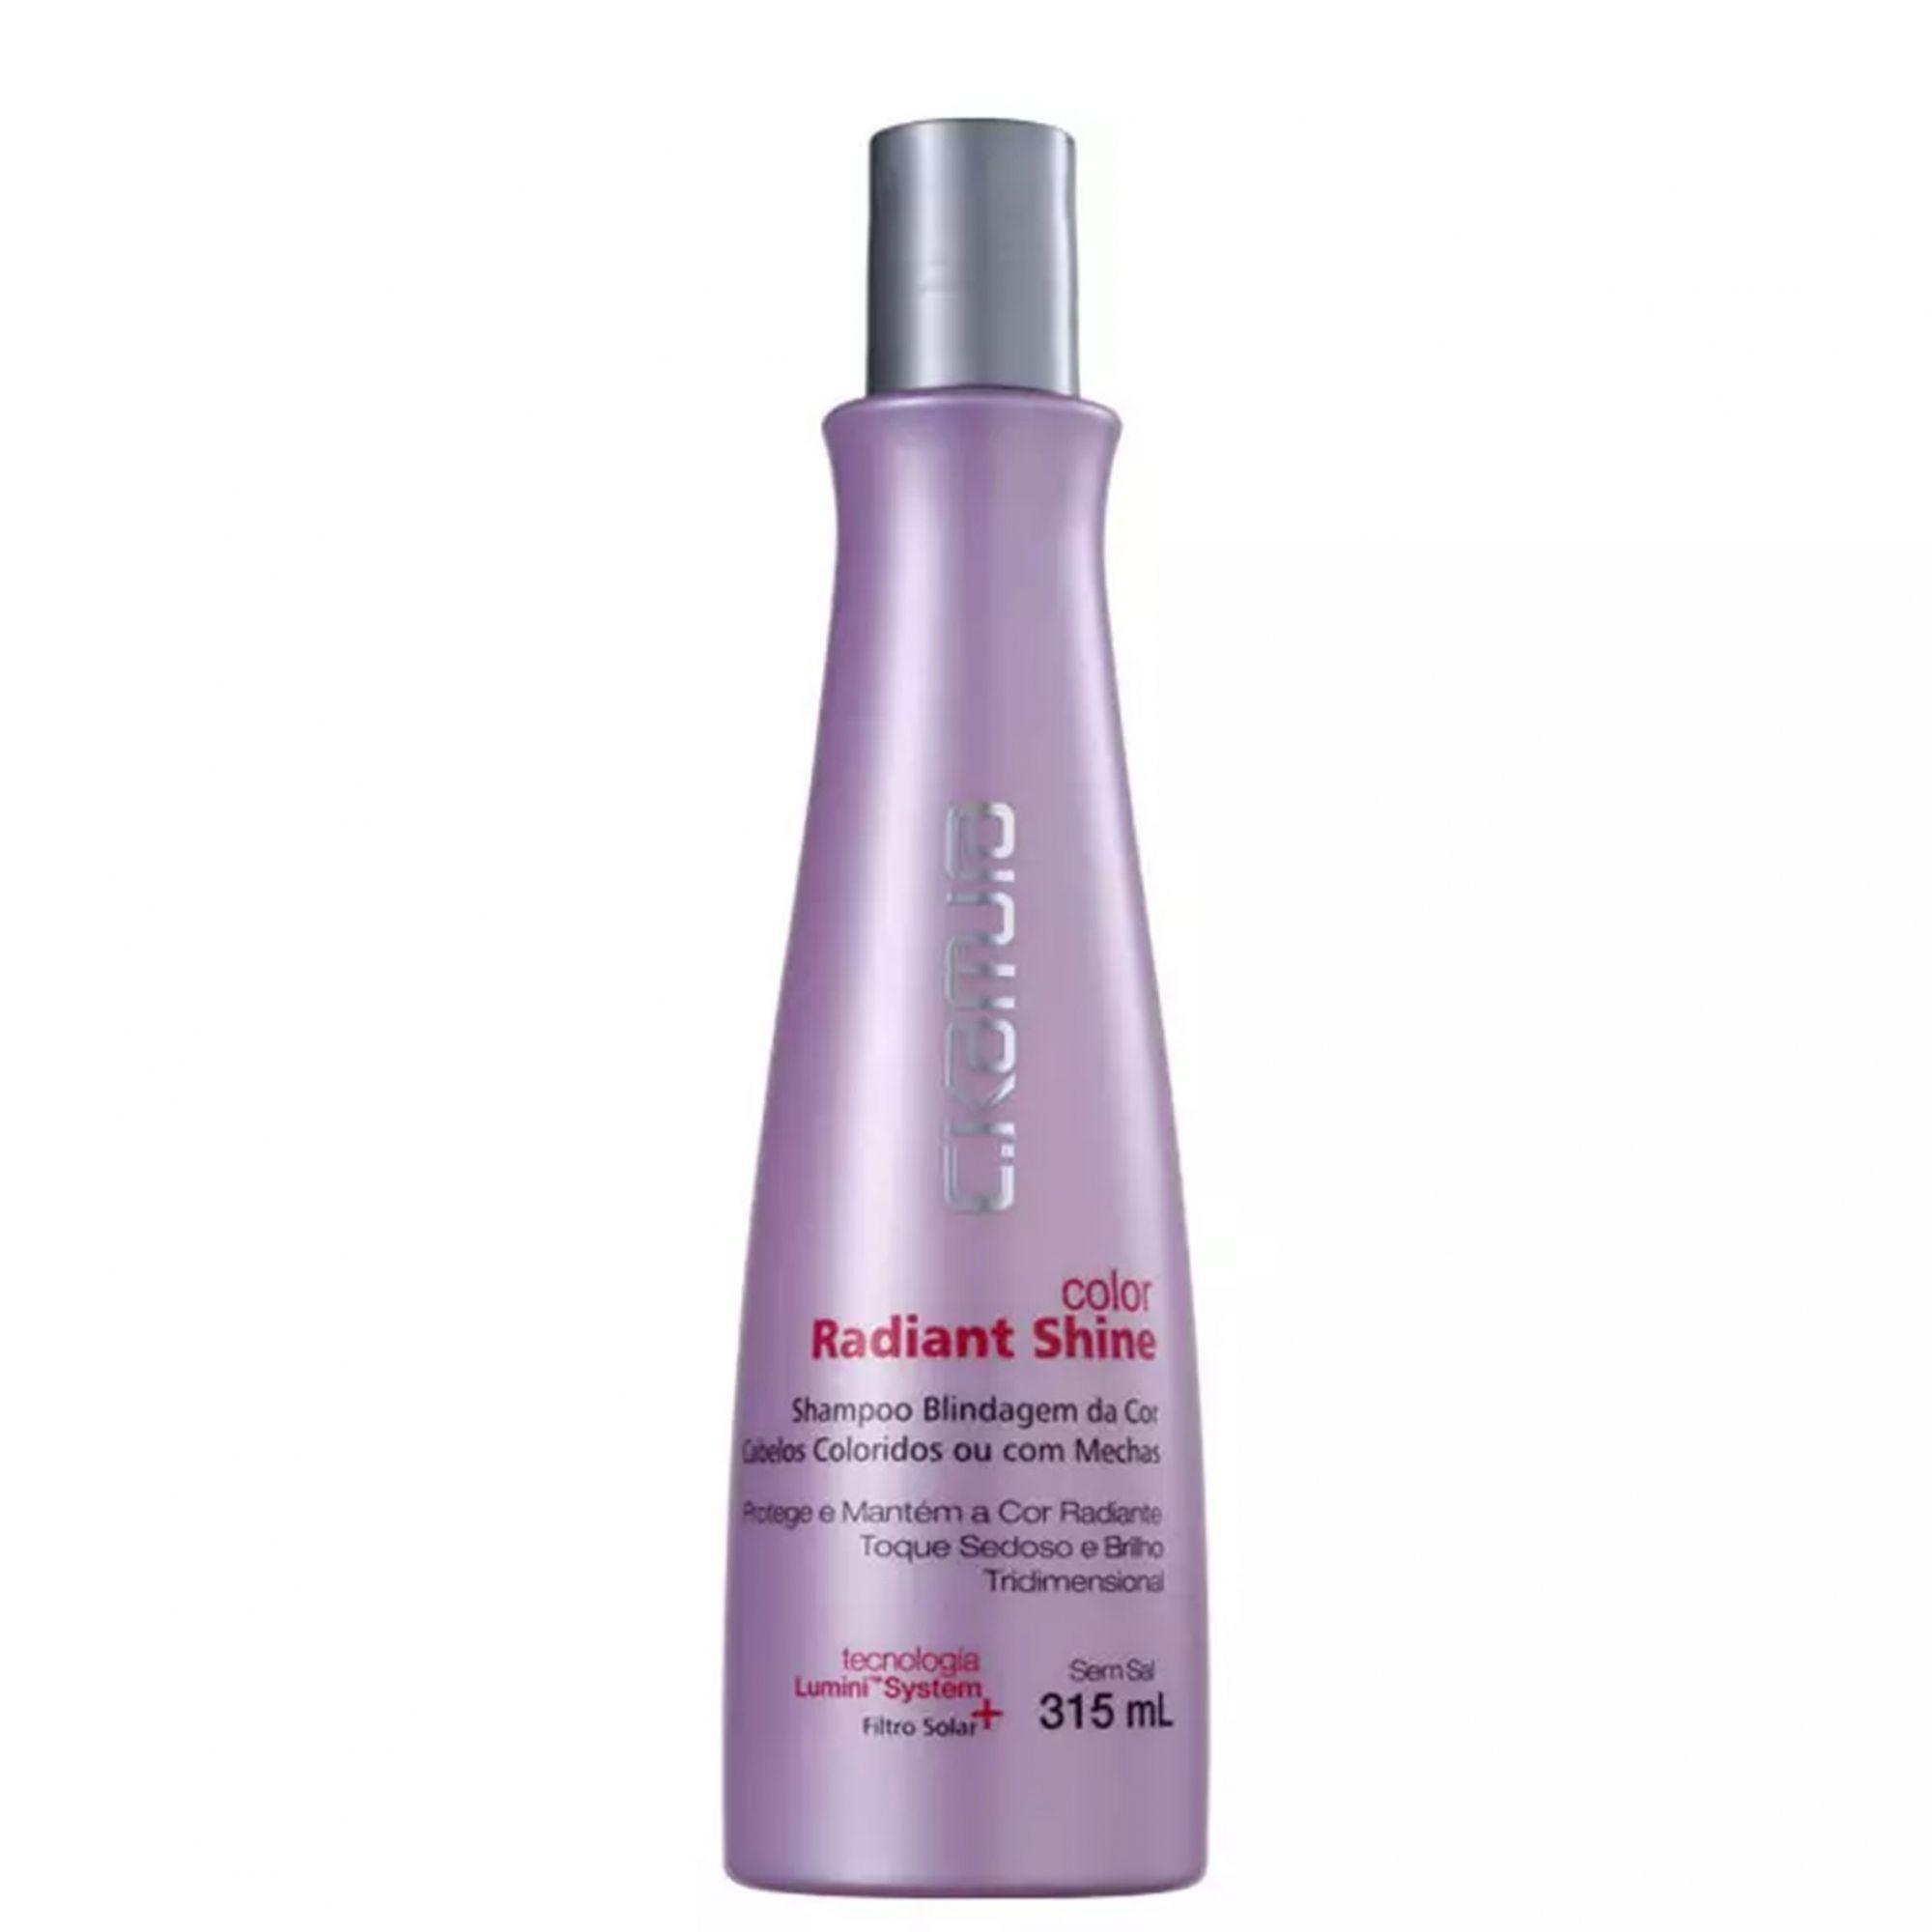 C.Kamura Color Radiant Shine - Shampoo 315ml.